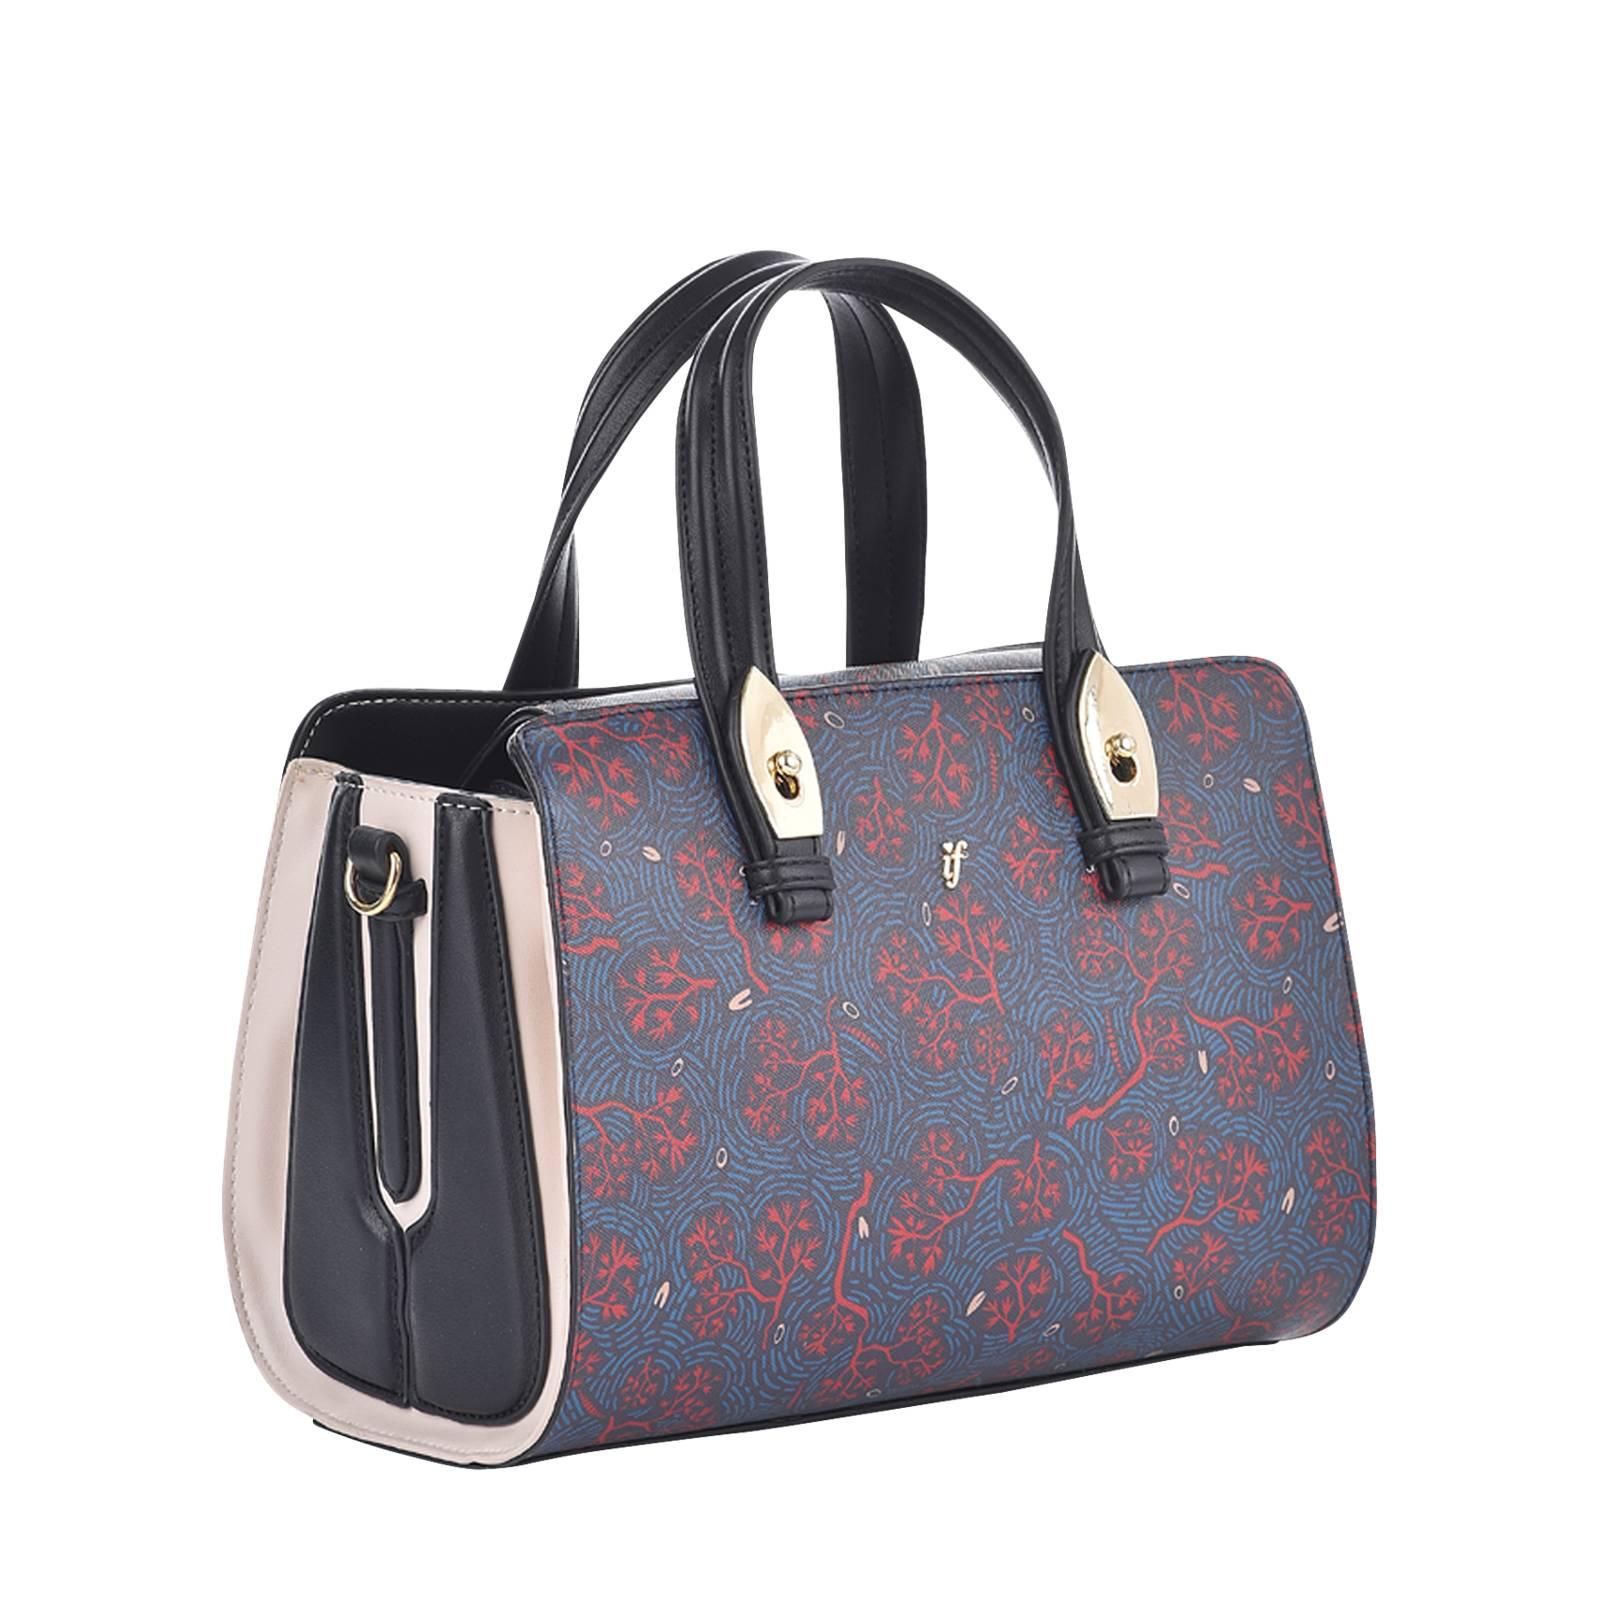 Mini Print - Γυναικεία τσάντα If από δερμα συνθετικο - Gianna ... 7c38025fb1d